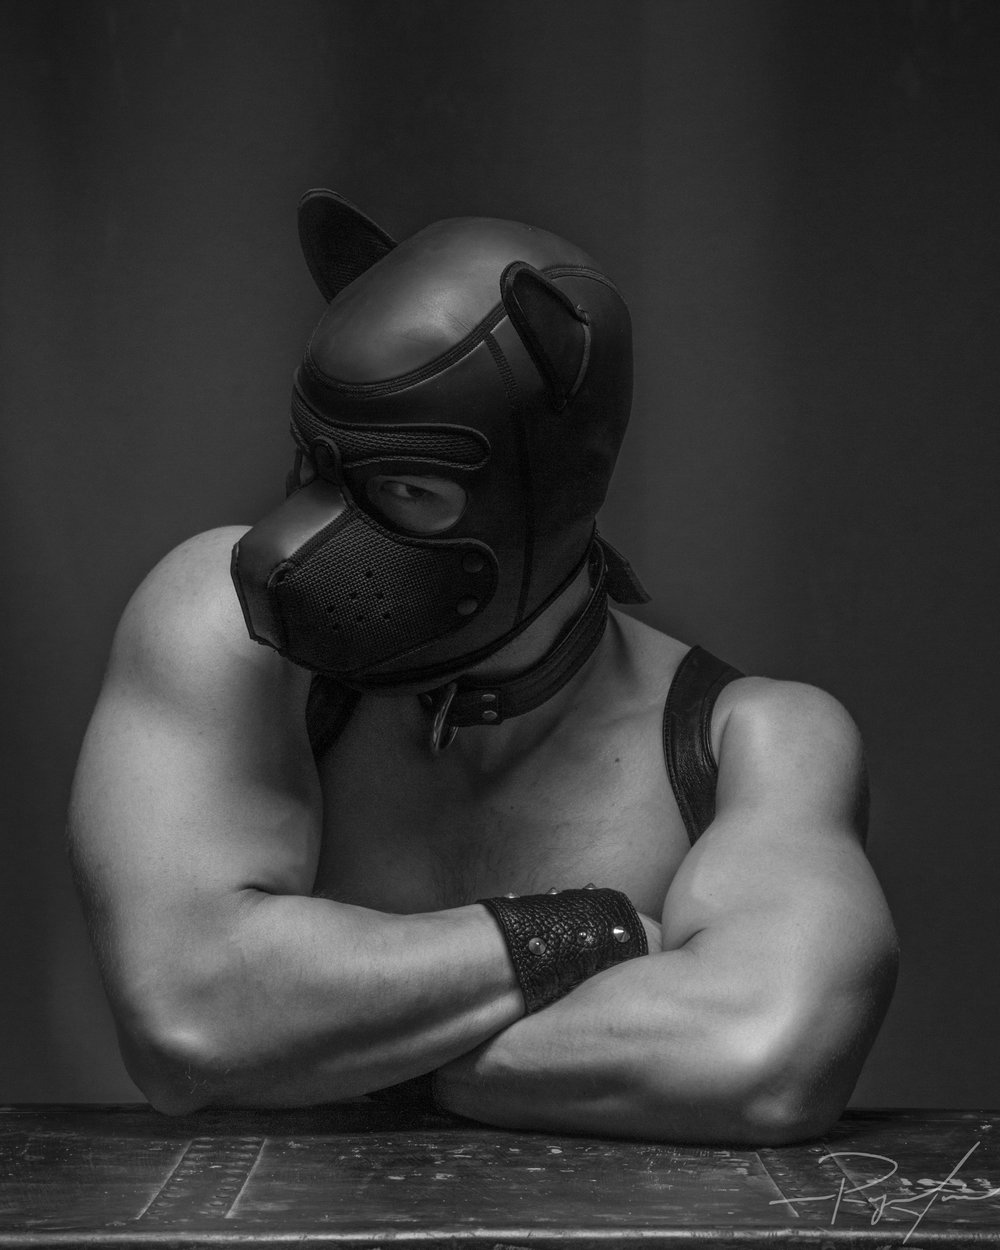 Pup_Stronger.jpg